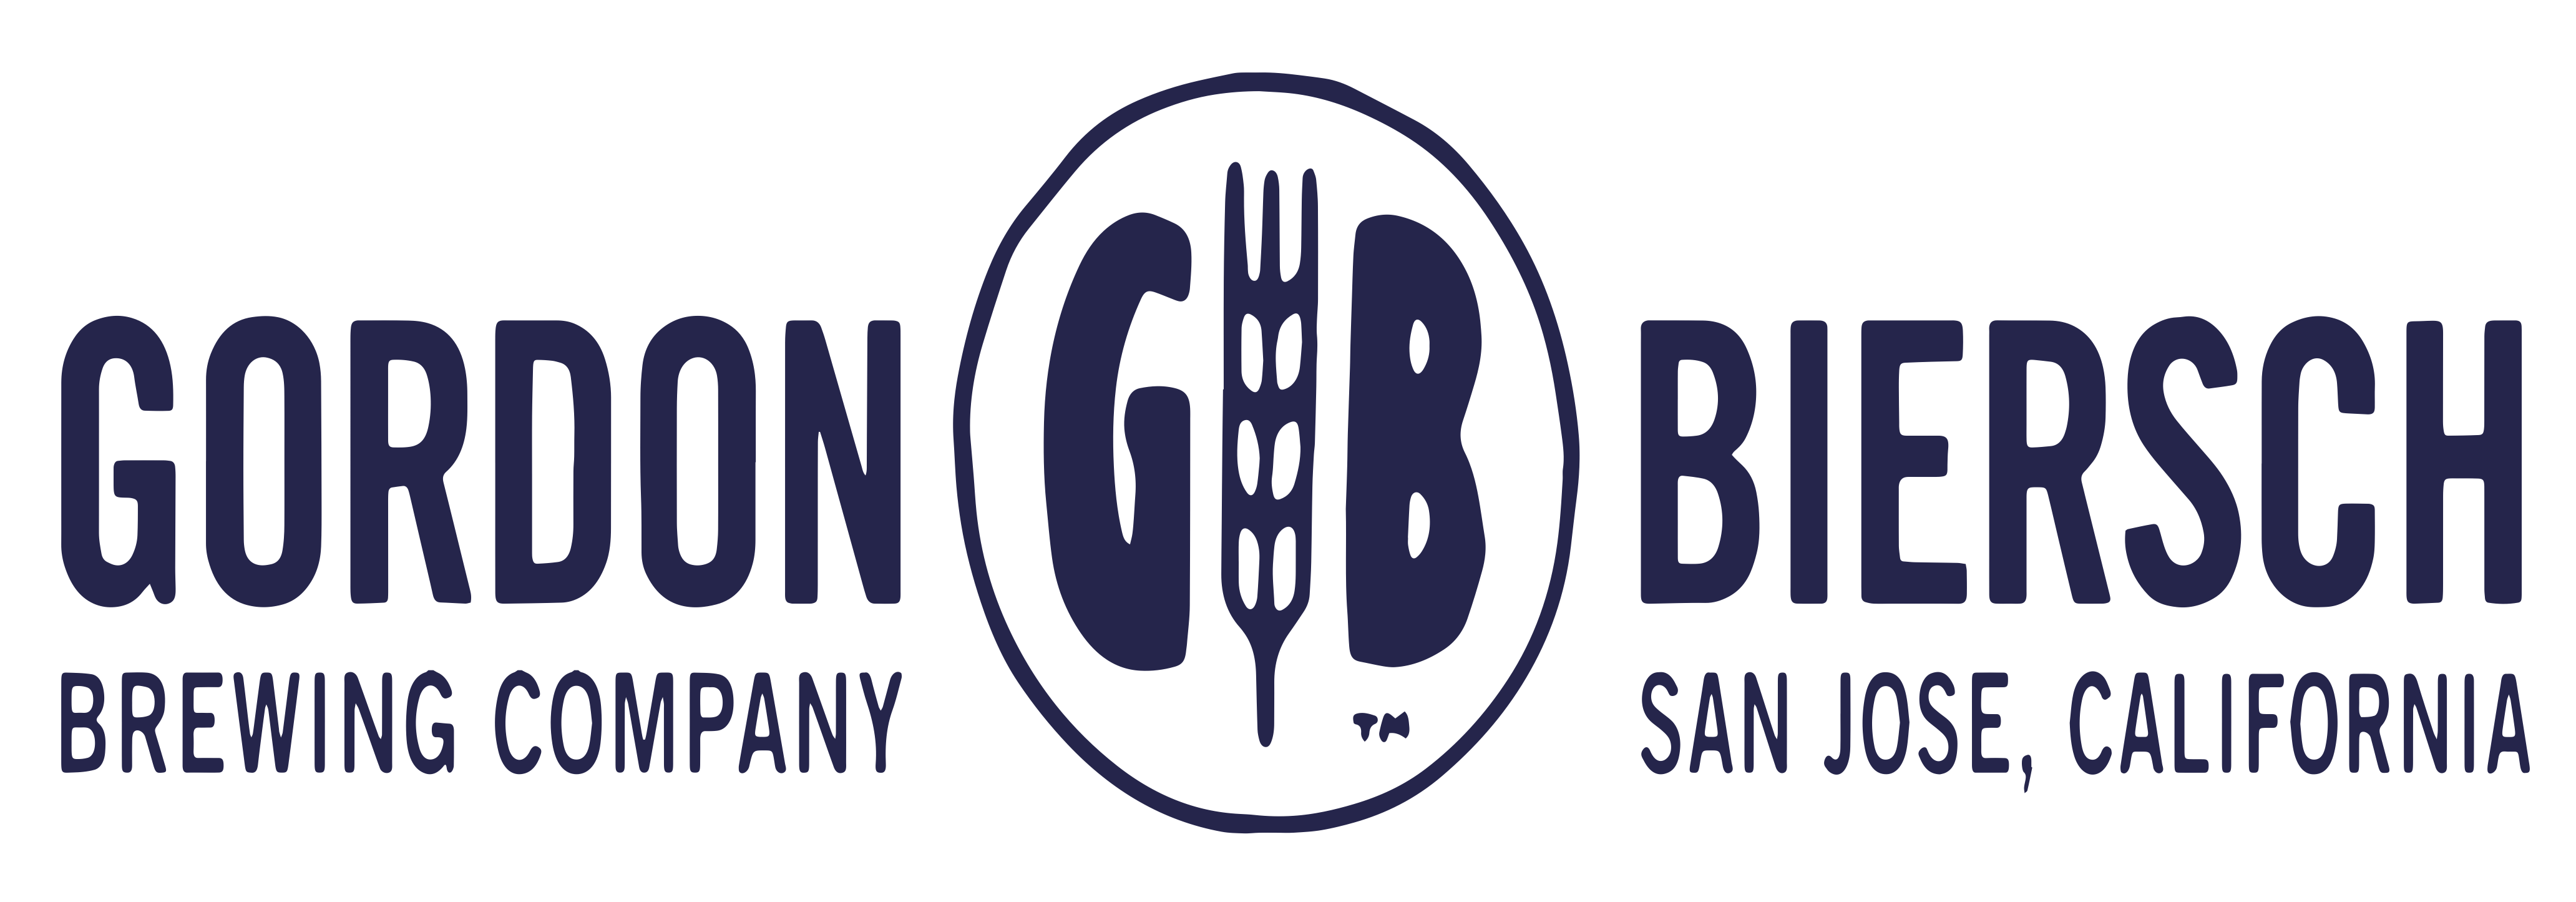 GB New Style Logos_03.13.18